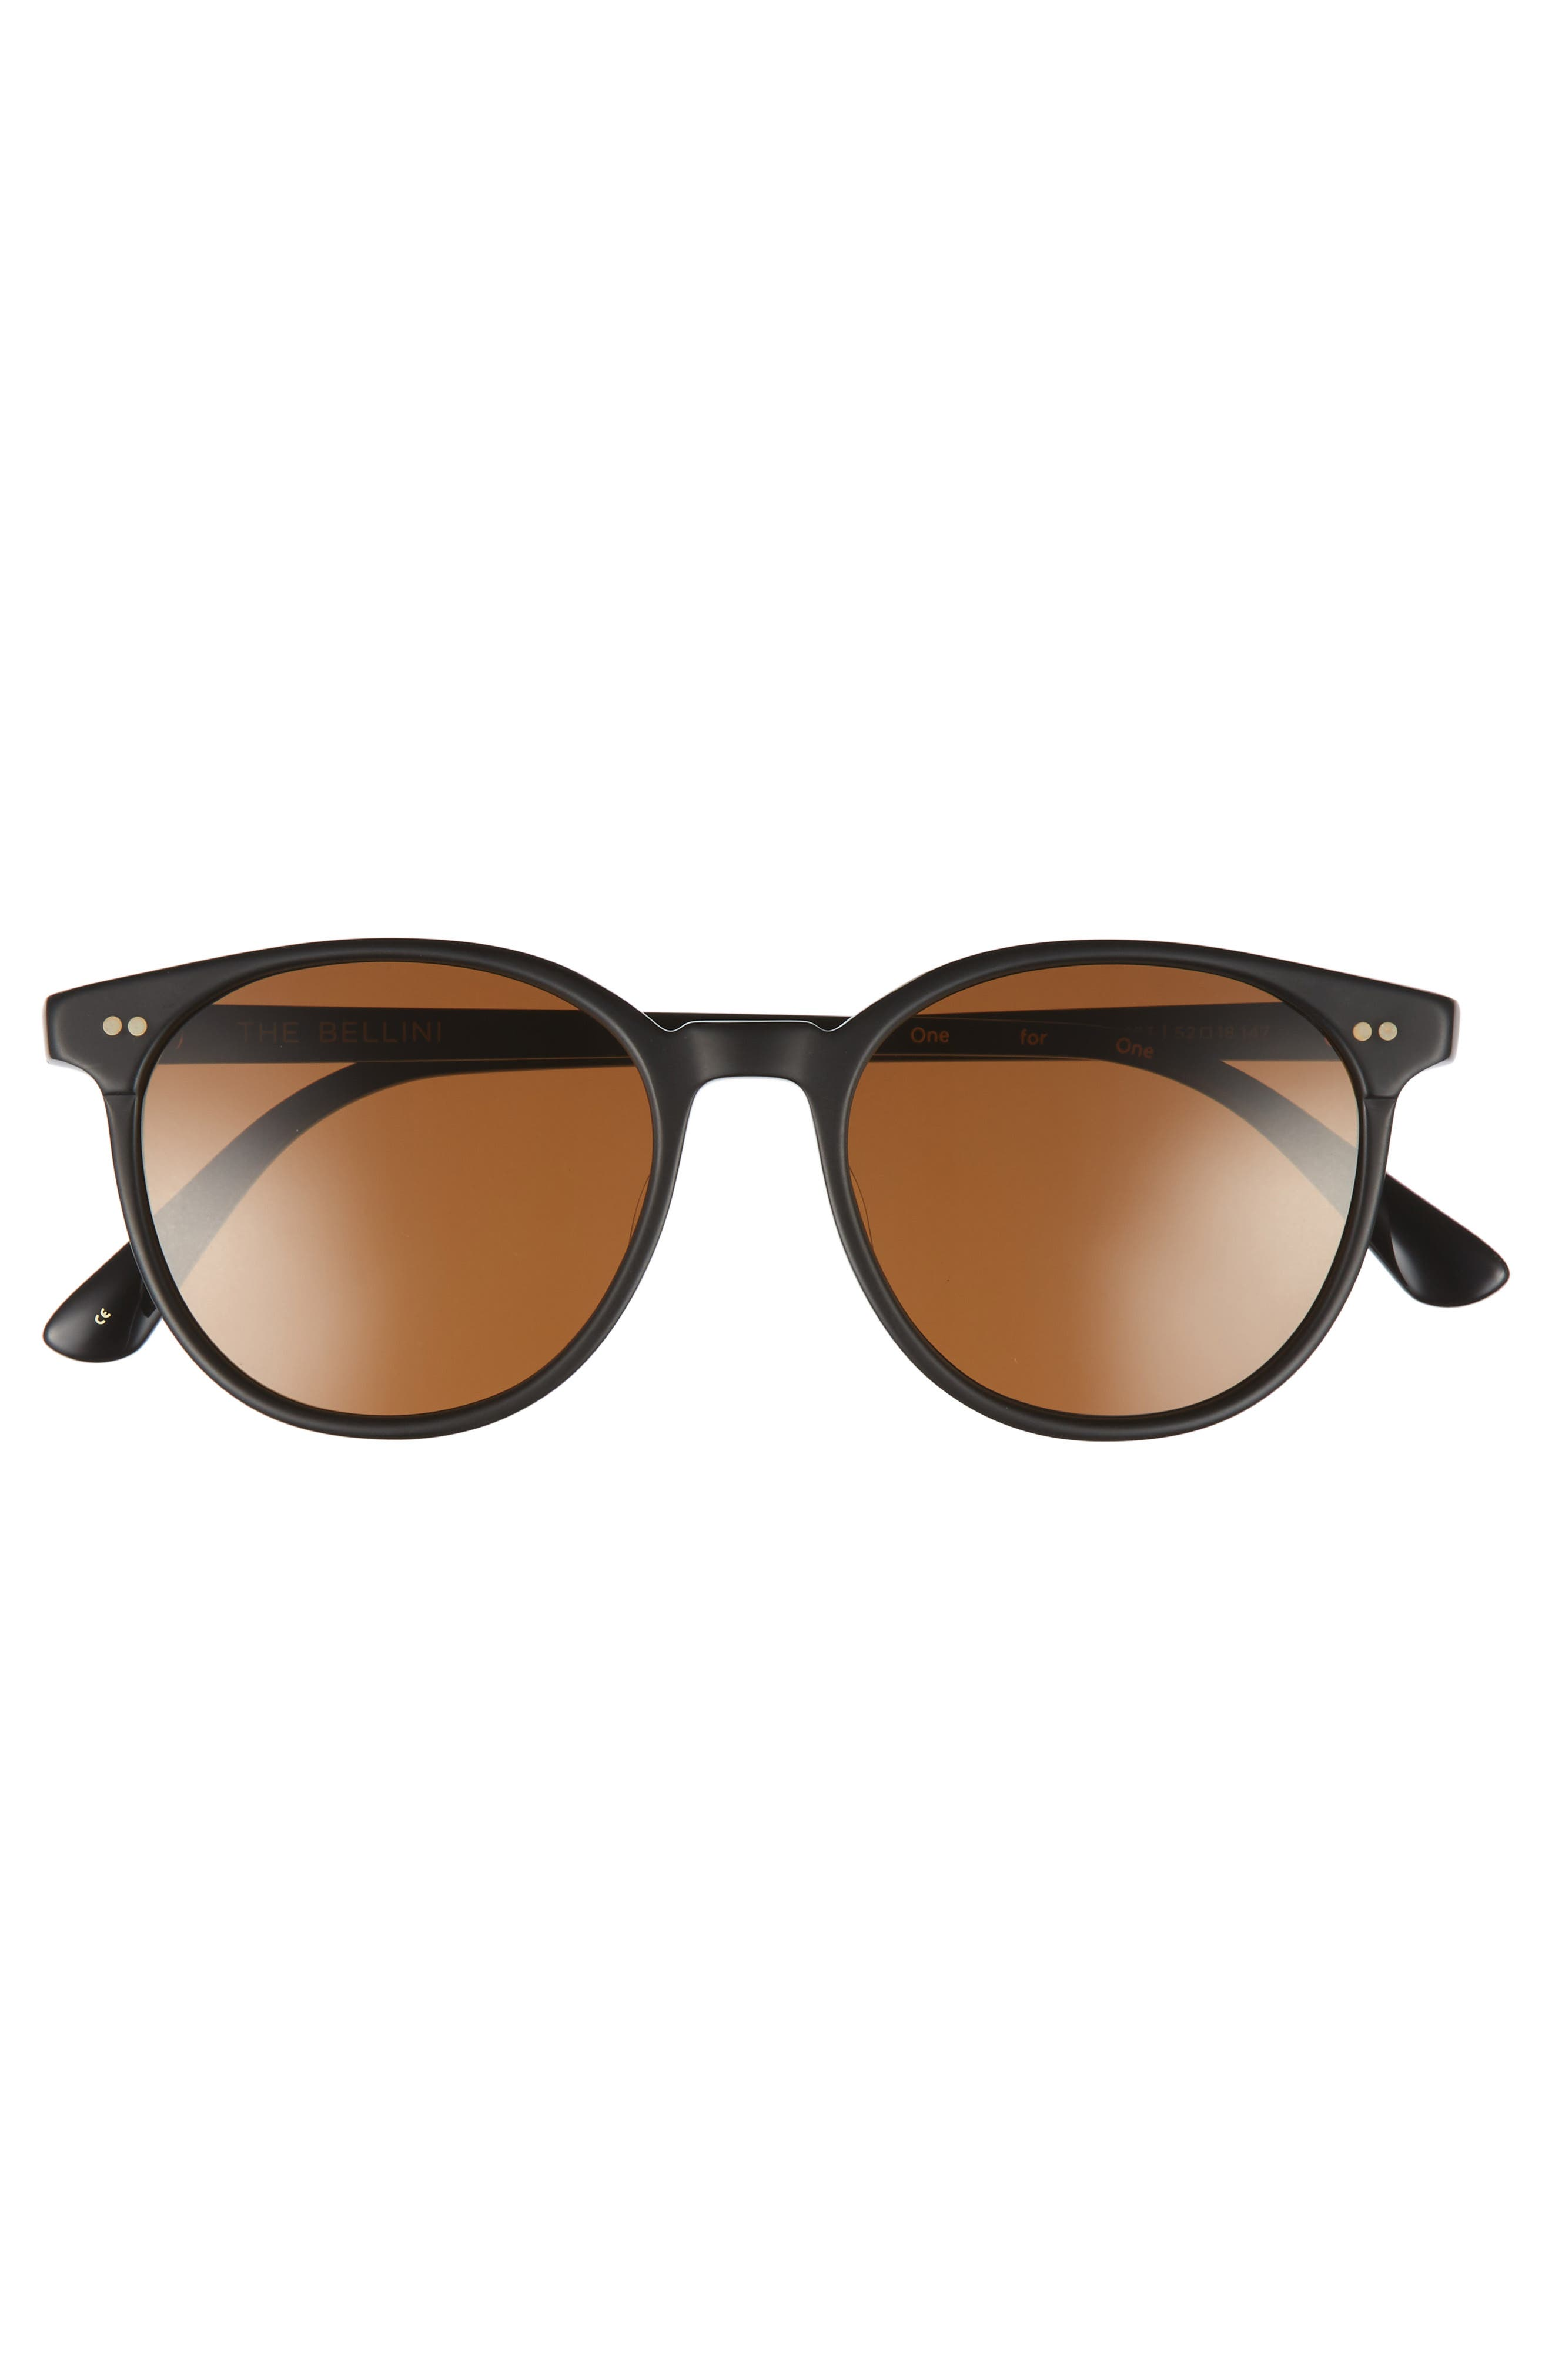 Bellini 52mm Sunglasses,                             Alternate thumbnail 2, color,                             001